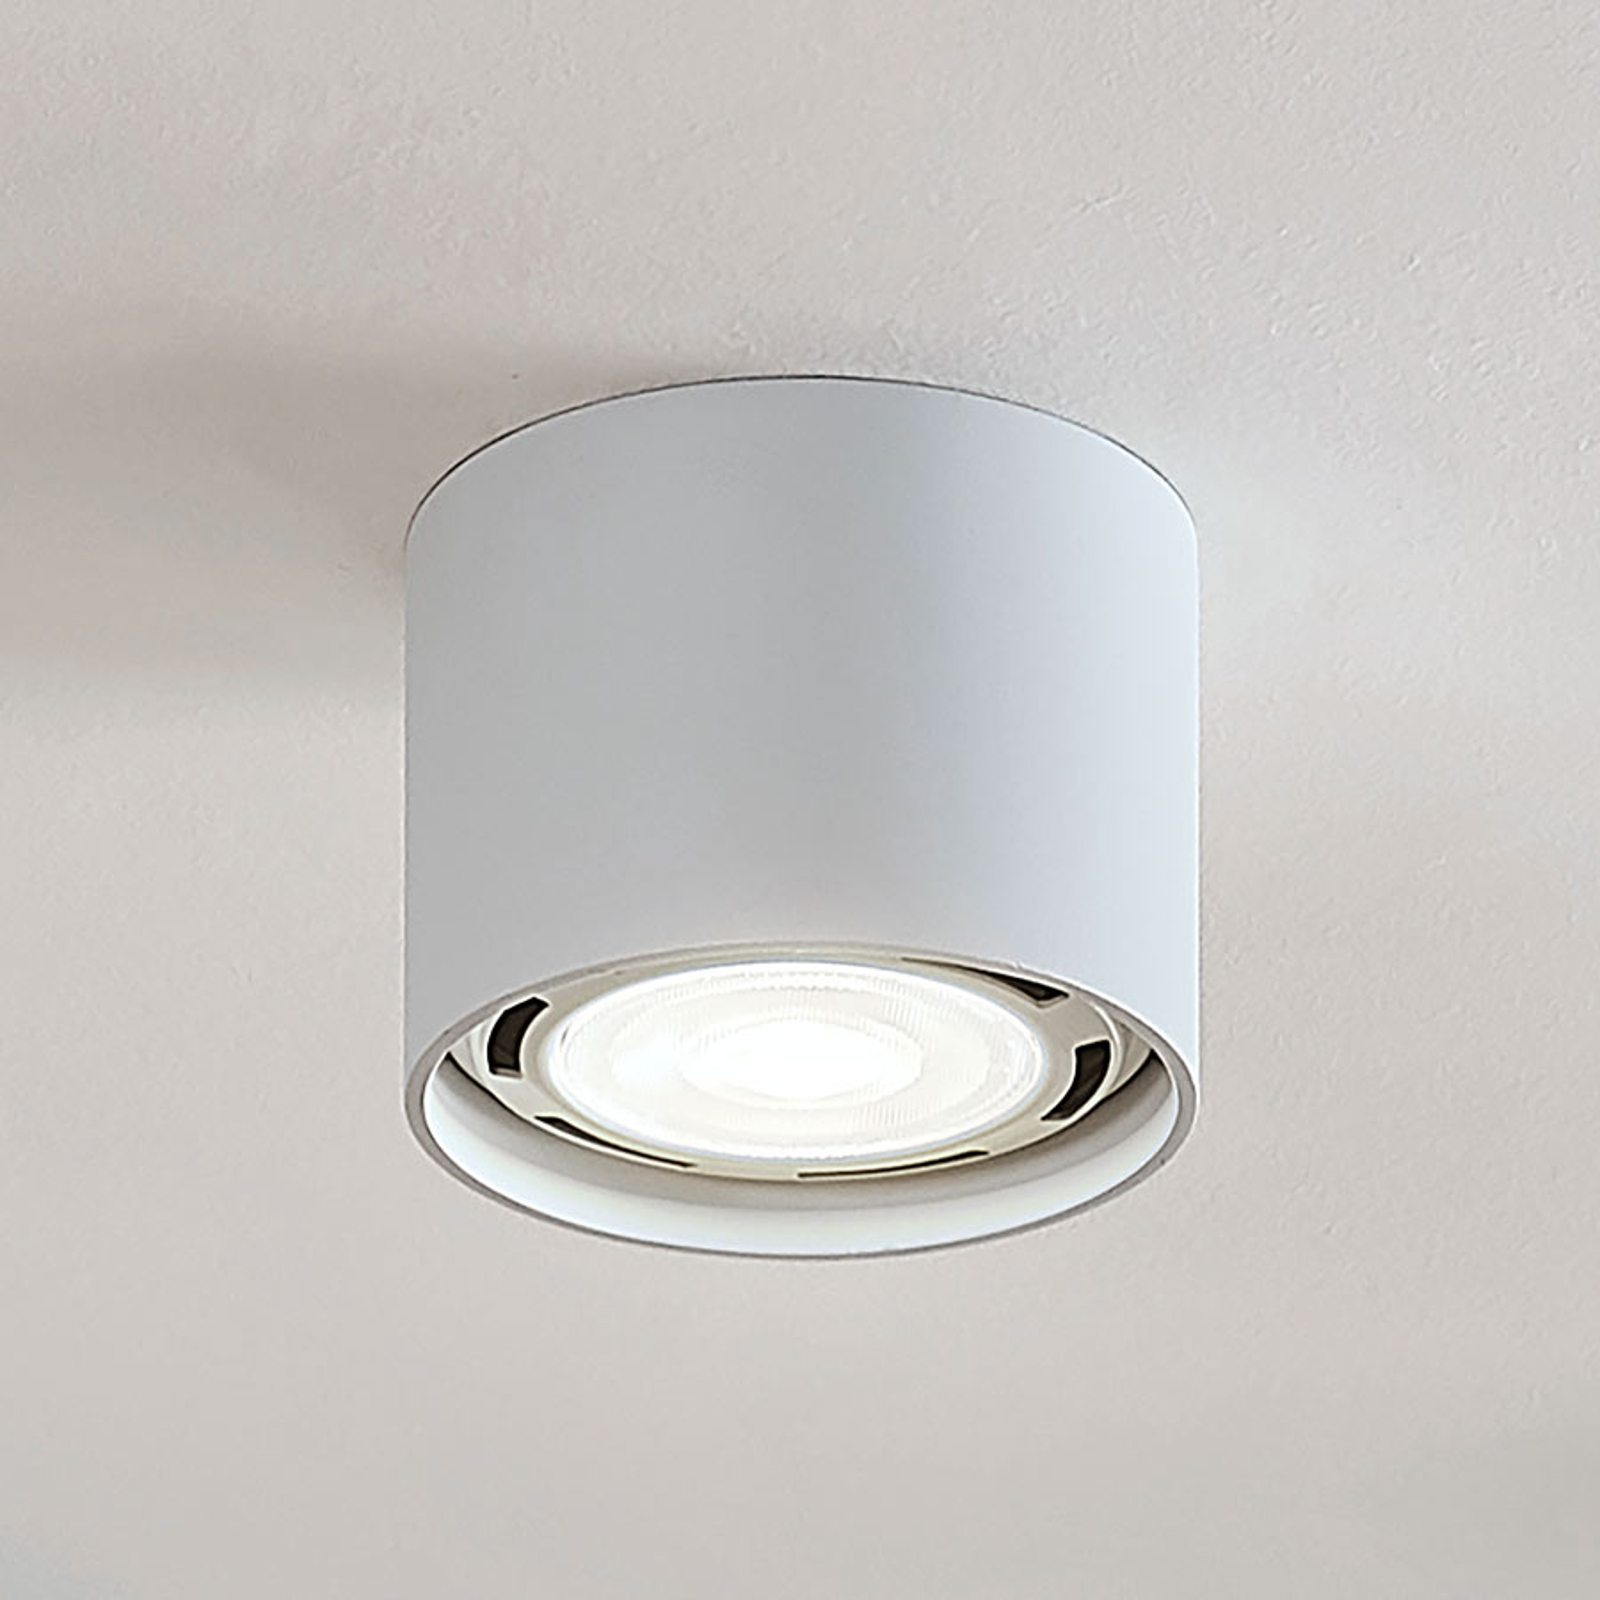 LED-takspot Mabel, rund, hvit